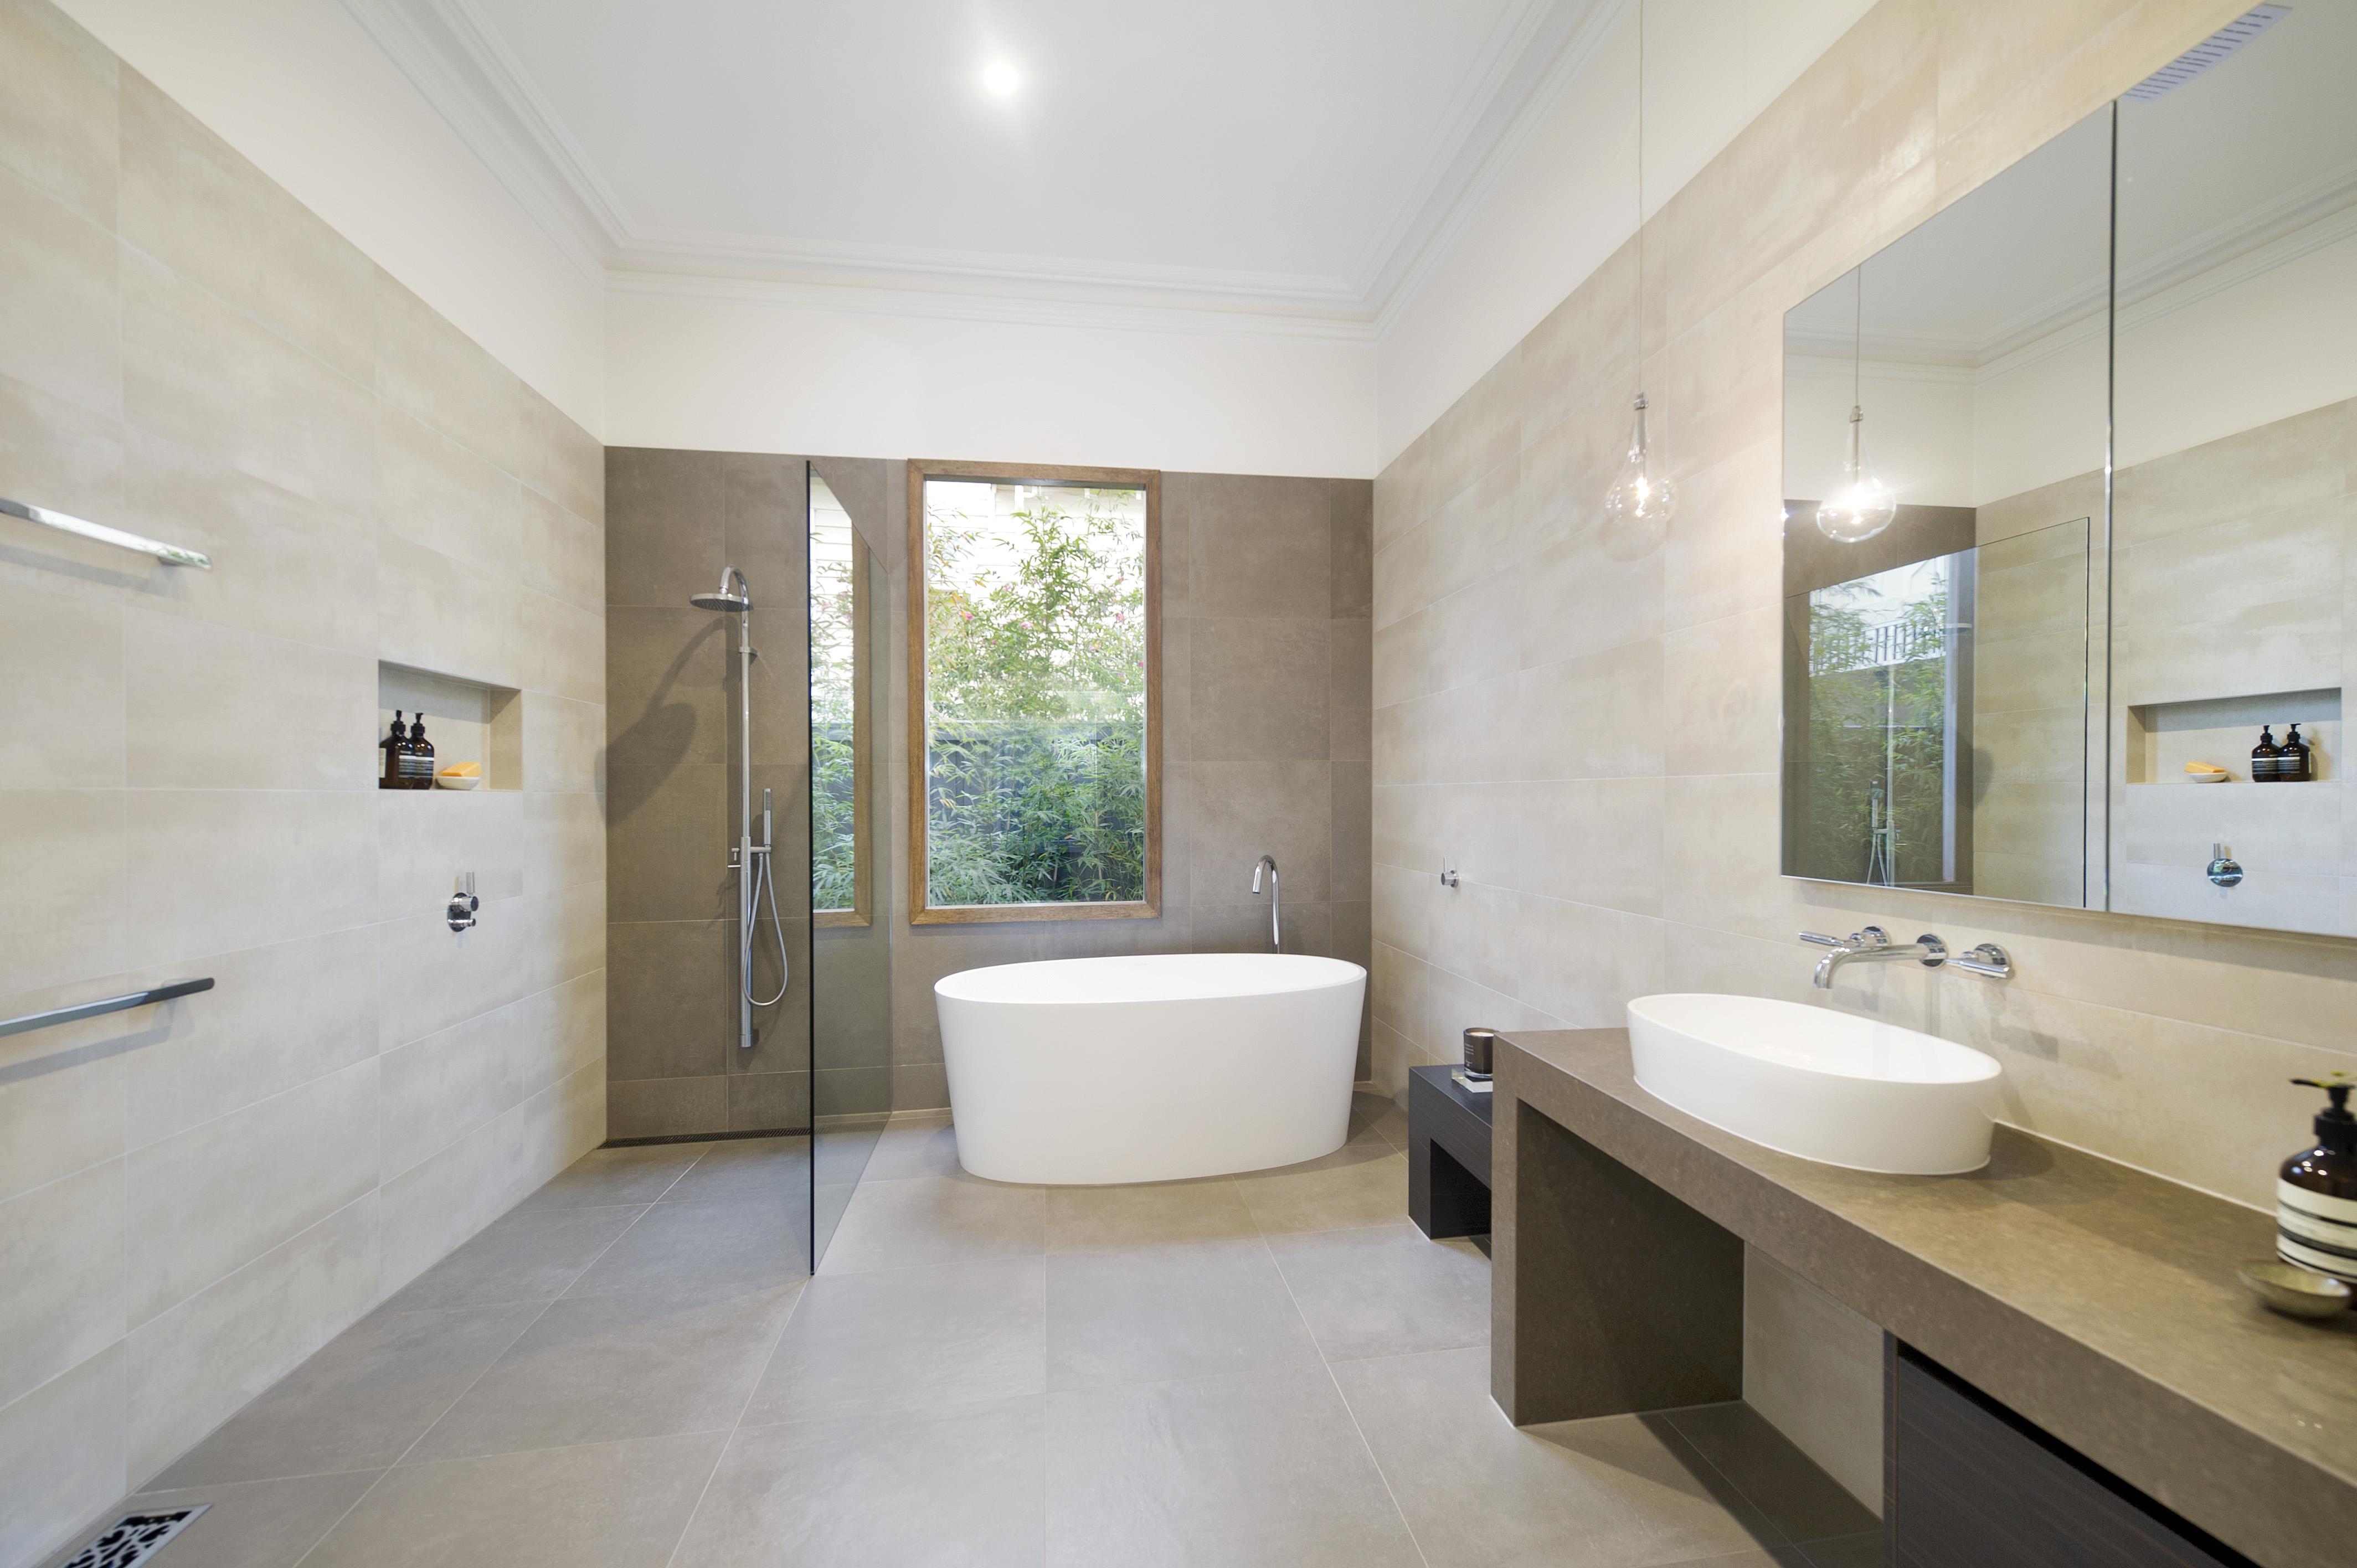 Cabinas De Baño Republica Dominicana:Bathroom Shower Tile Wall Cut ...